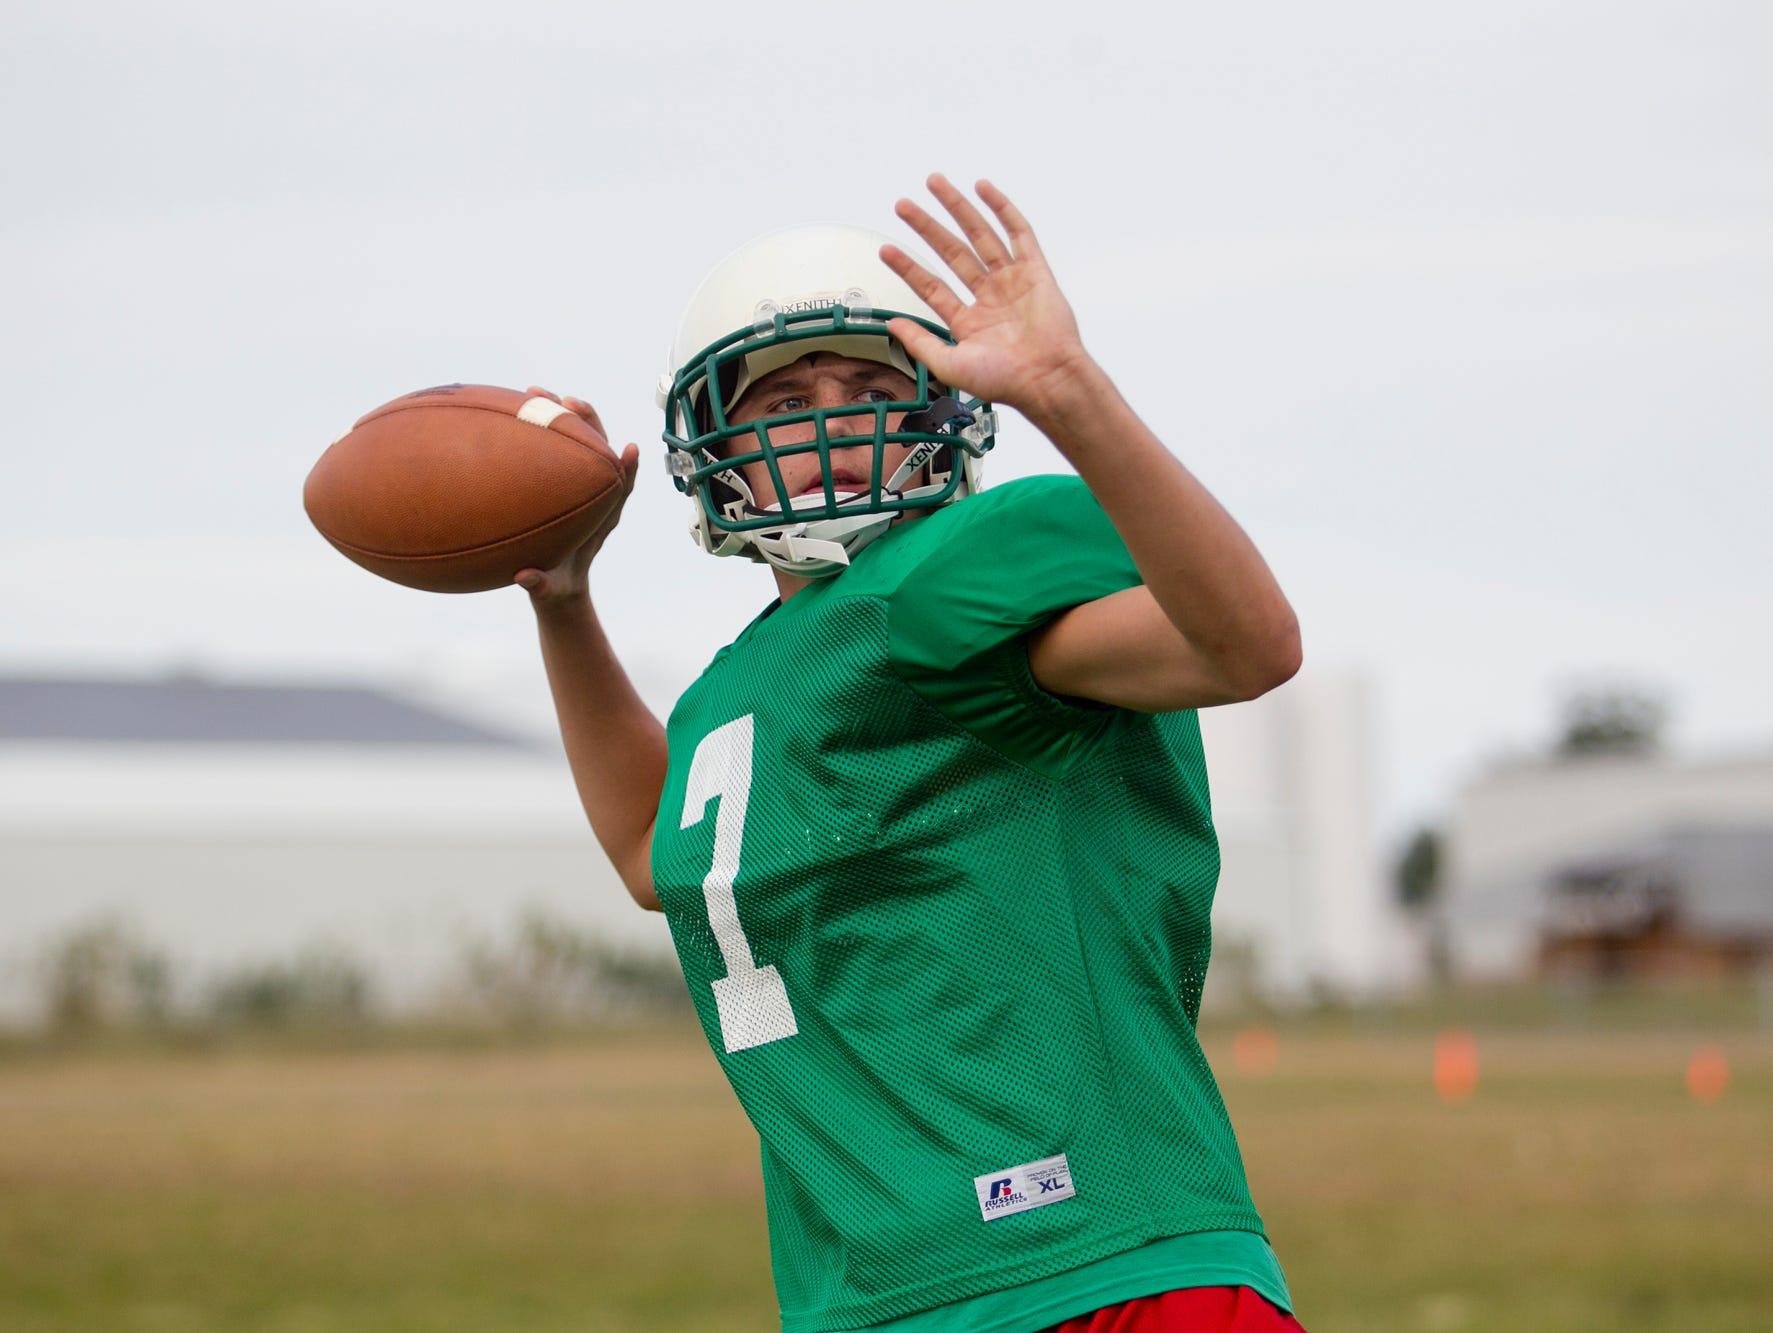 Wyatt Richtmyre looks to throw the ball at Almond-Bancroft football practice on Thursday, Aug. 6, 2015.